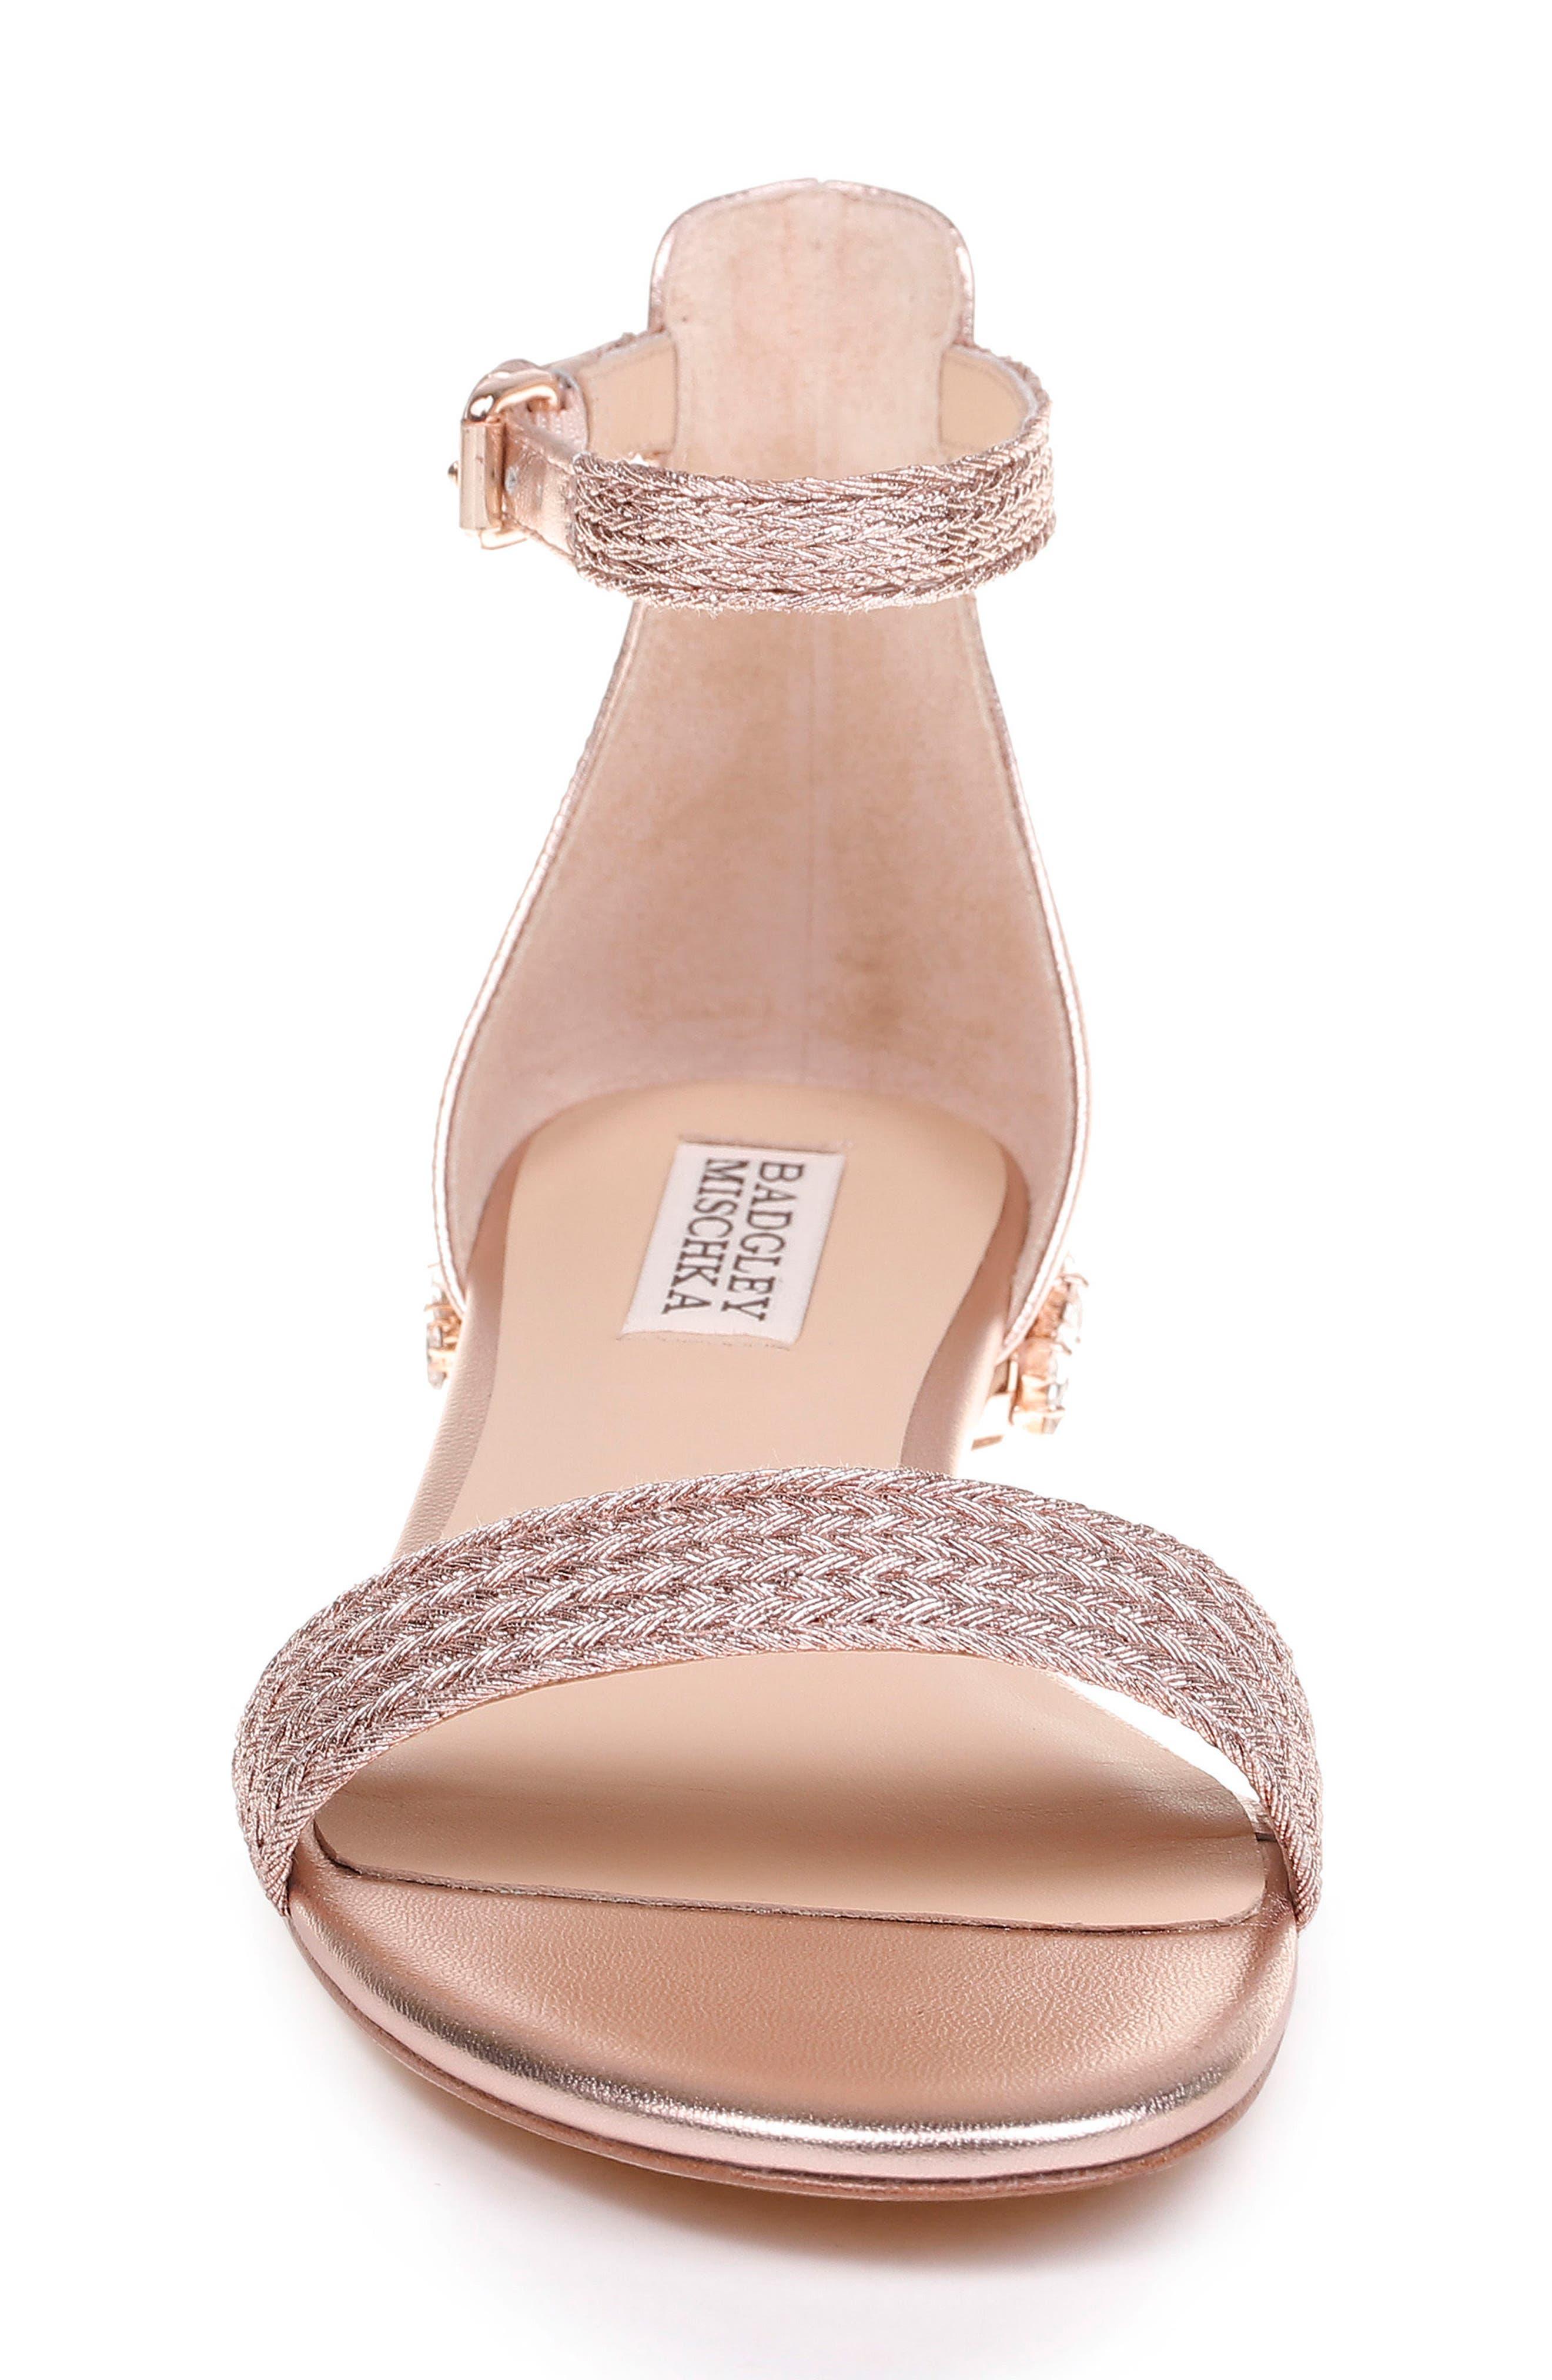 Steffie Ankle Strap Sandal,                             Alternate thumbnail 4, color,                             ROSE GOLD LEATHER